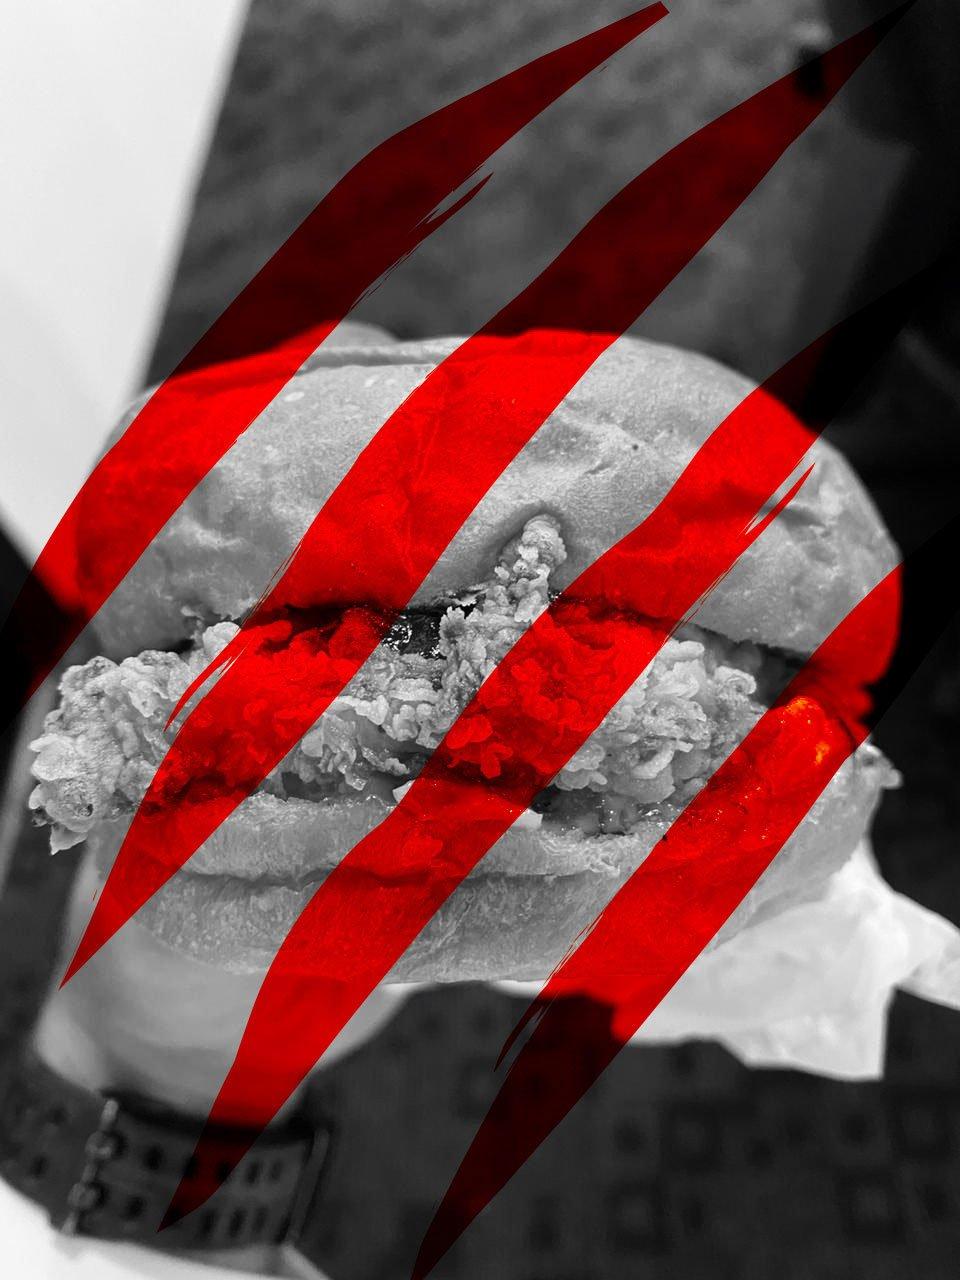 Firezilla Sandwich With Red Scratch